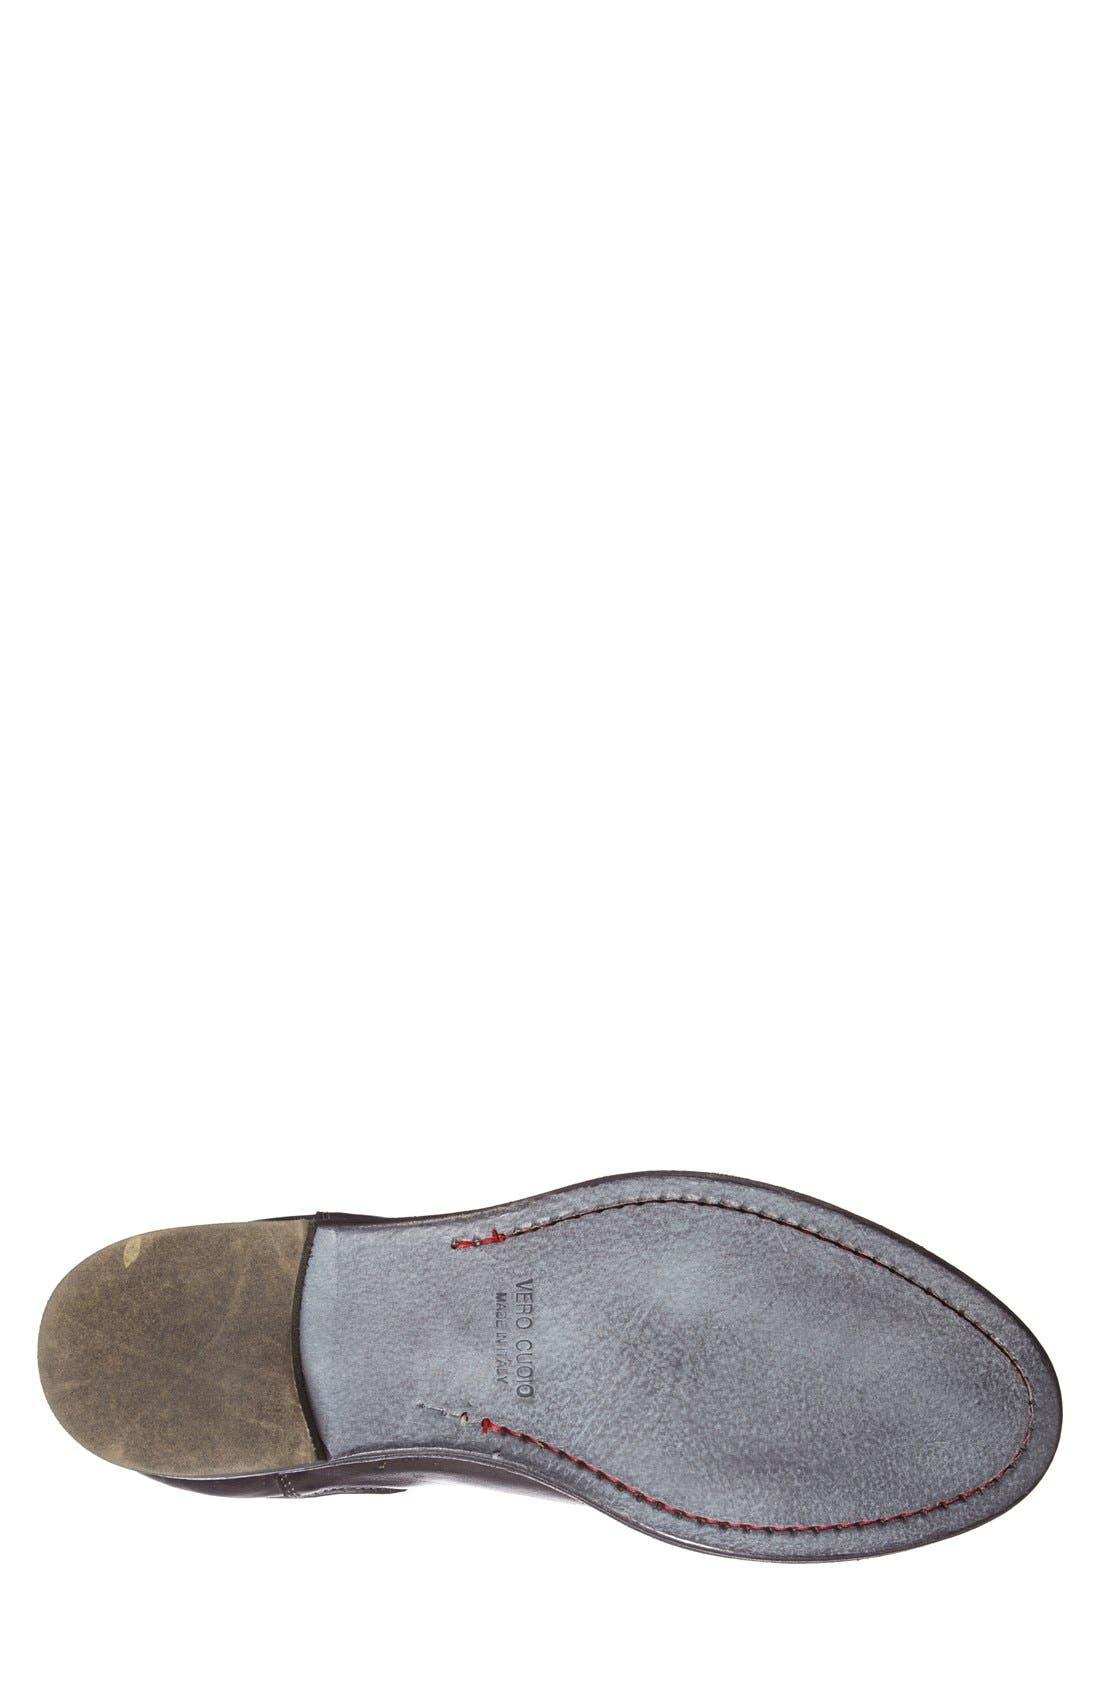 Chelsea Boot,                             Alternate thumbnail 2, color,                             020